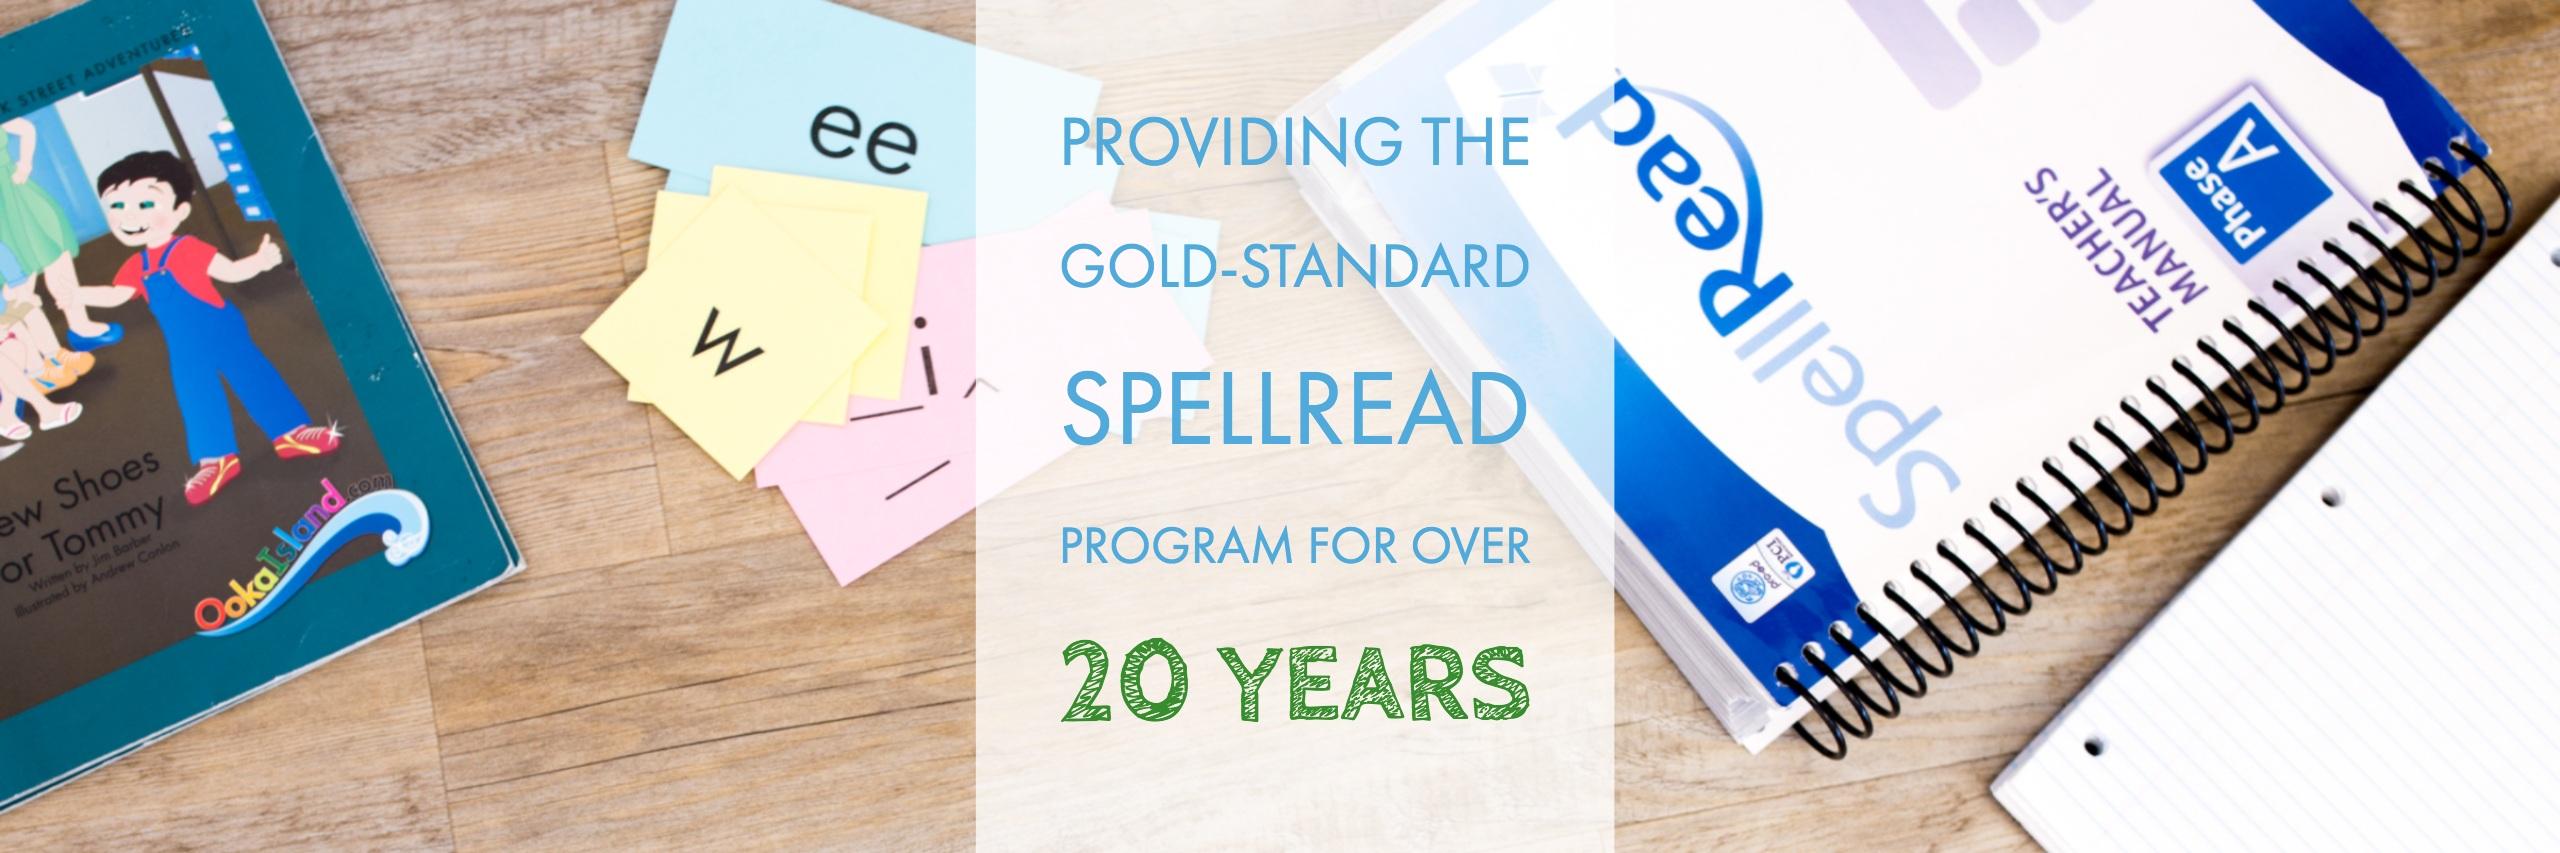 halifax learning spellread spell read write learn tutor tutoring education literacy reading program reading support literacy